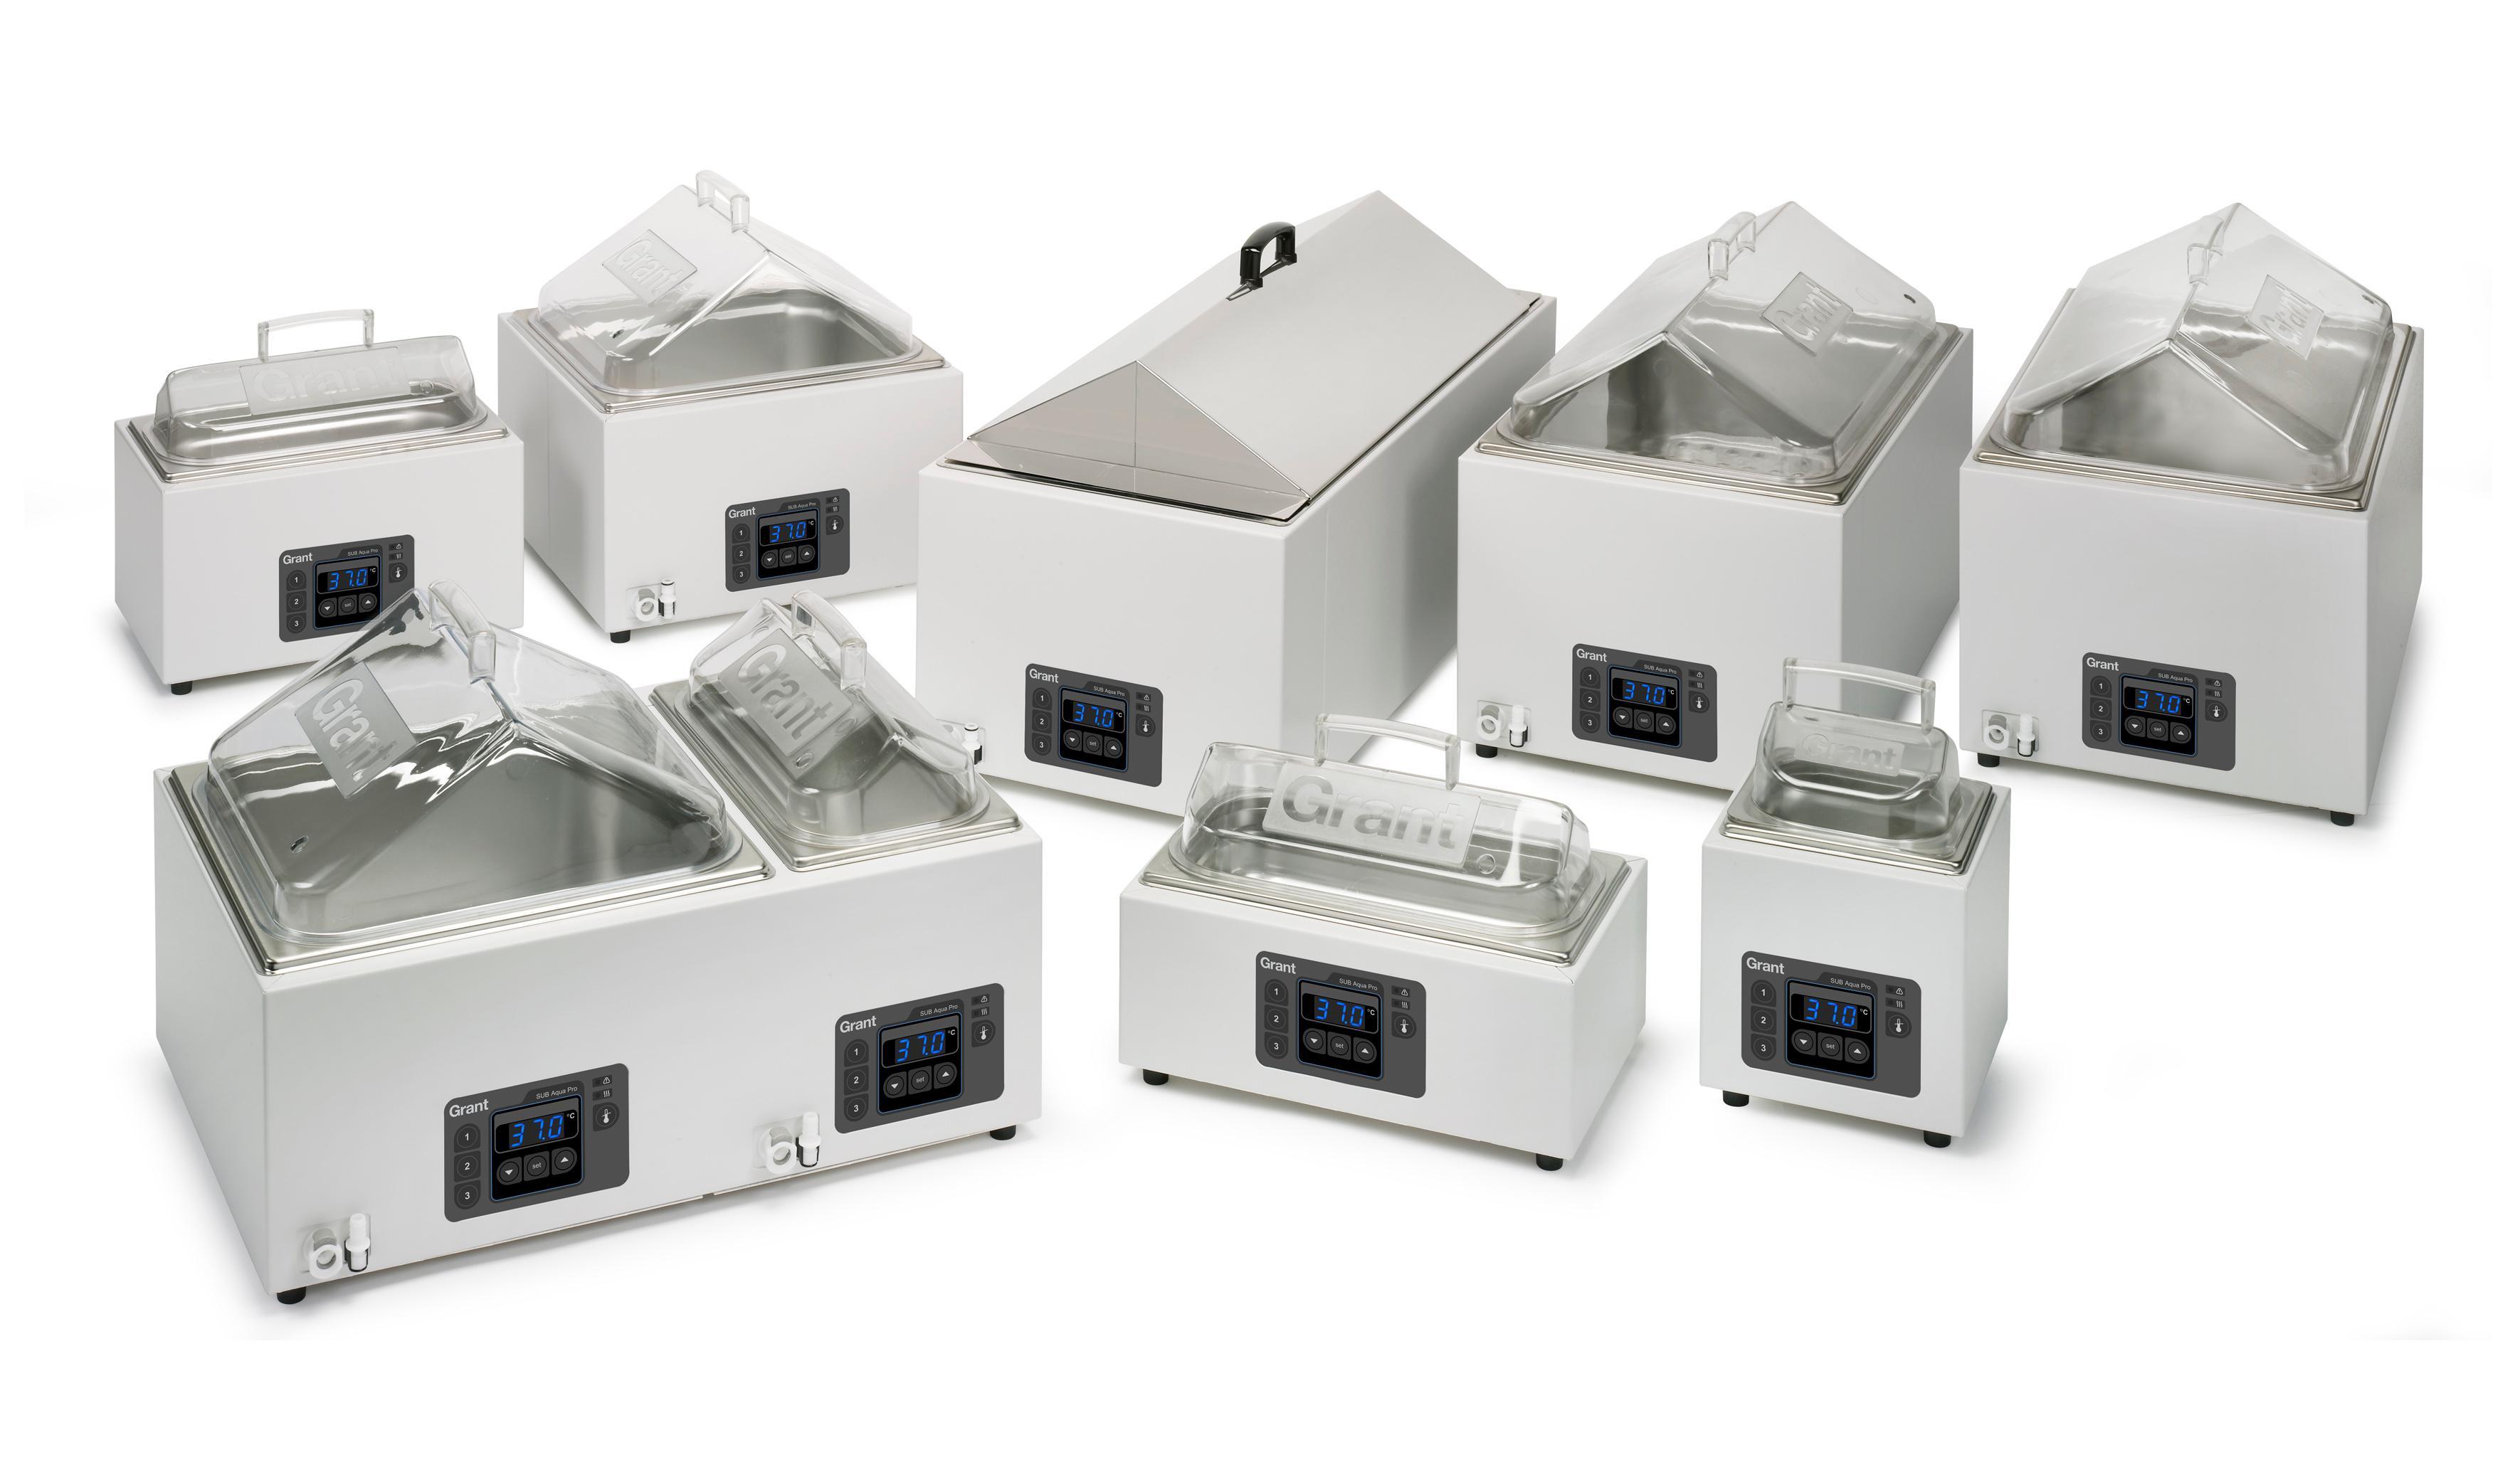 Grant Instruments SAP12 US Advanced Digital Water Bath